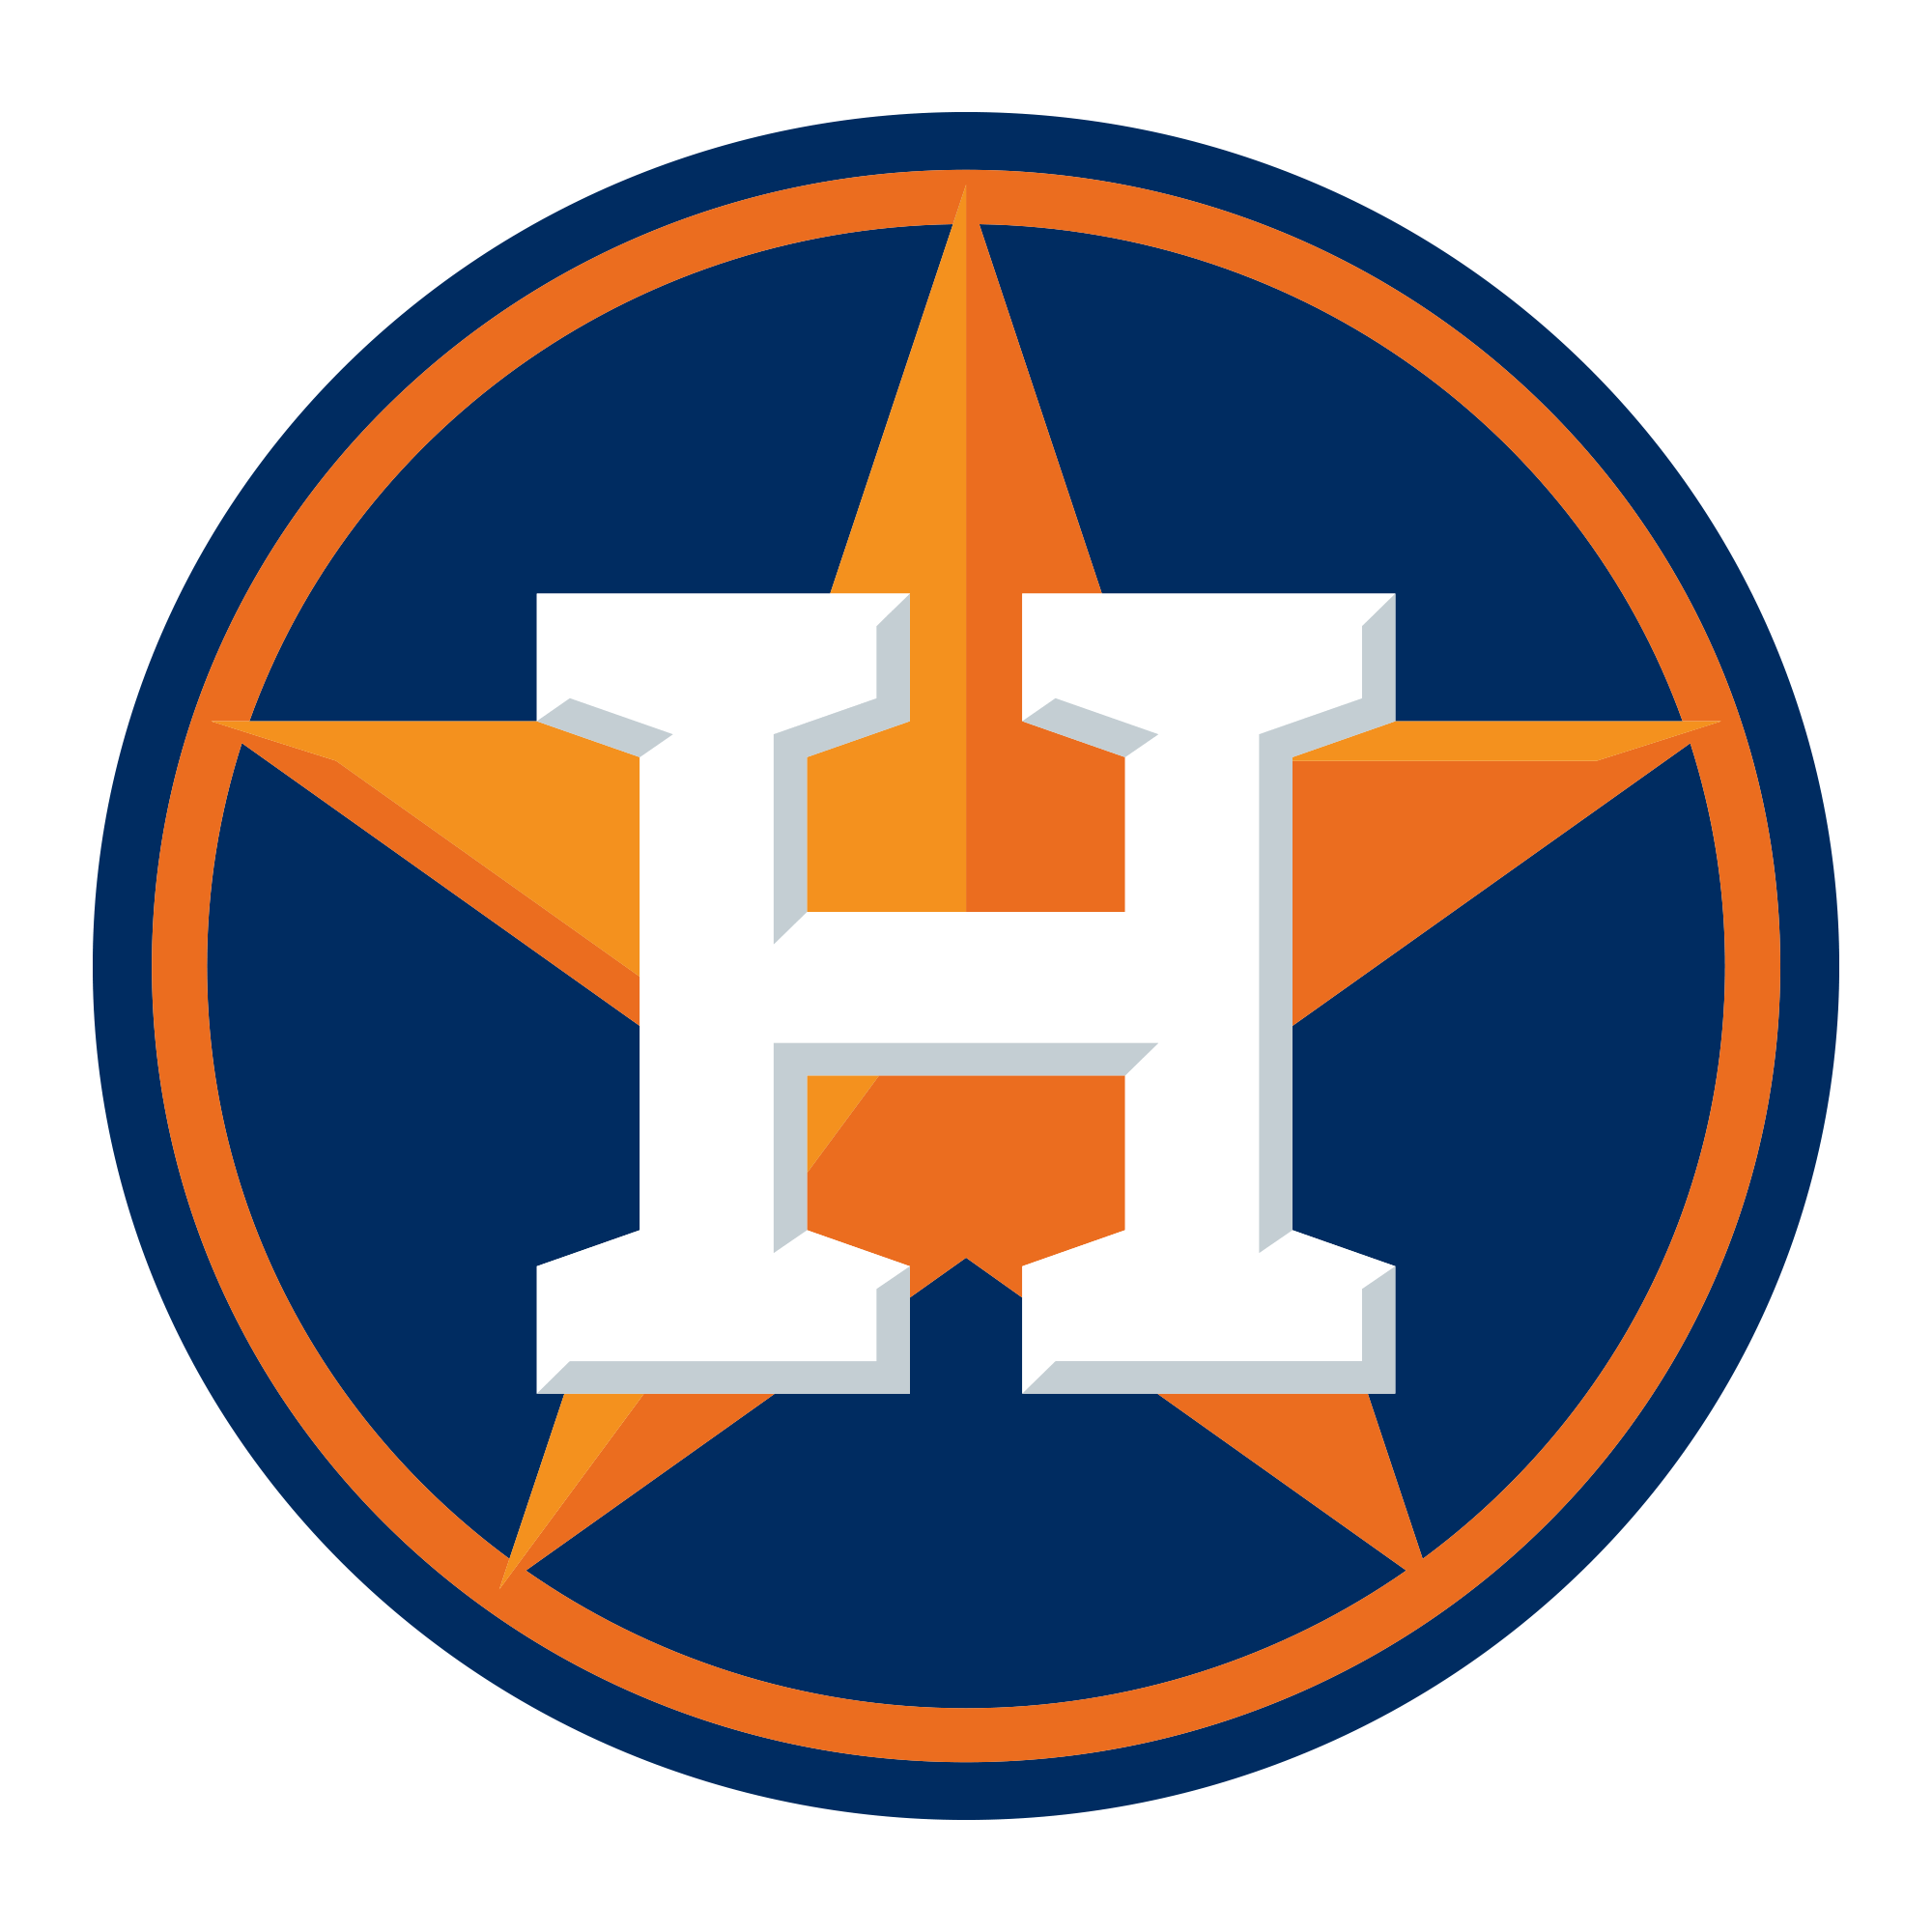 Houston Astros Logo transparent PNG.